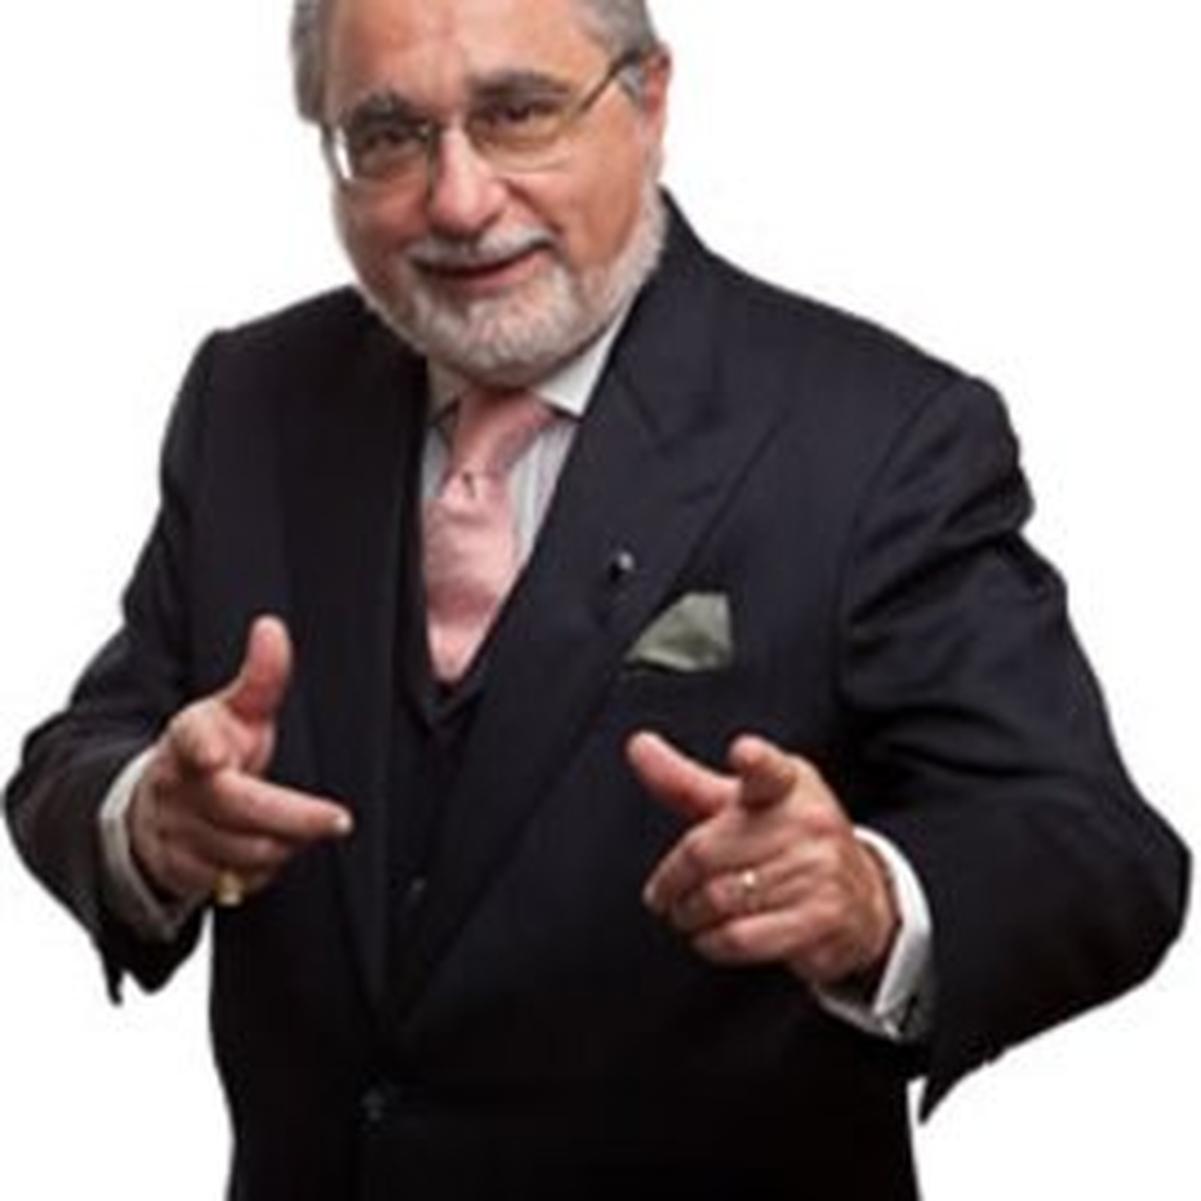 Stephan Schiffman